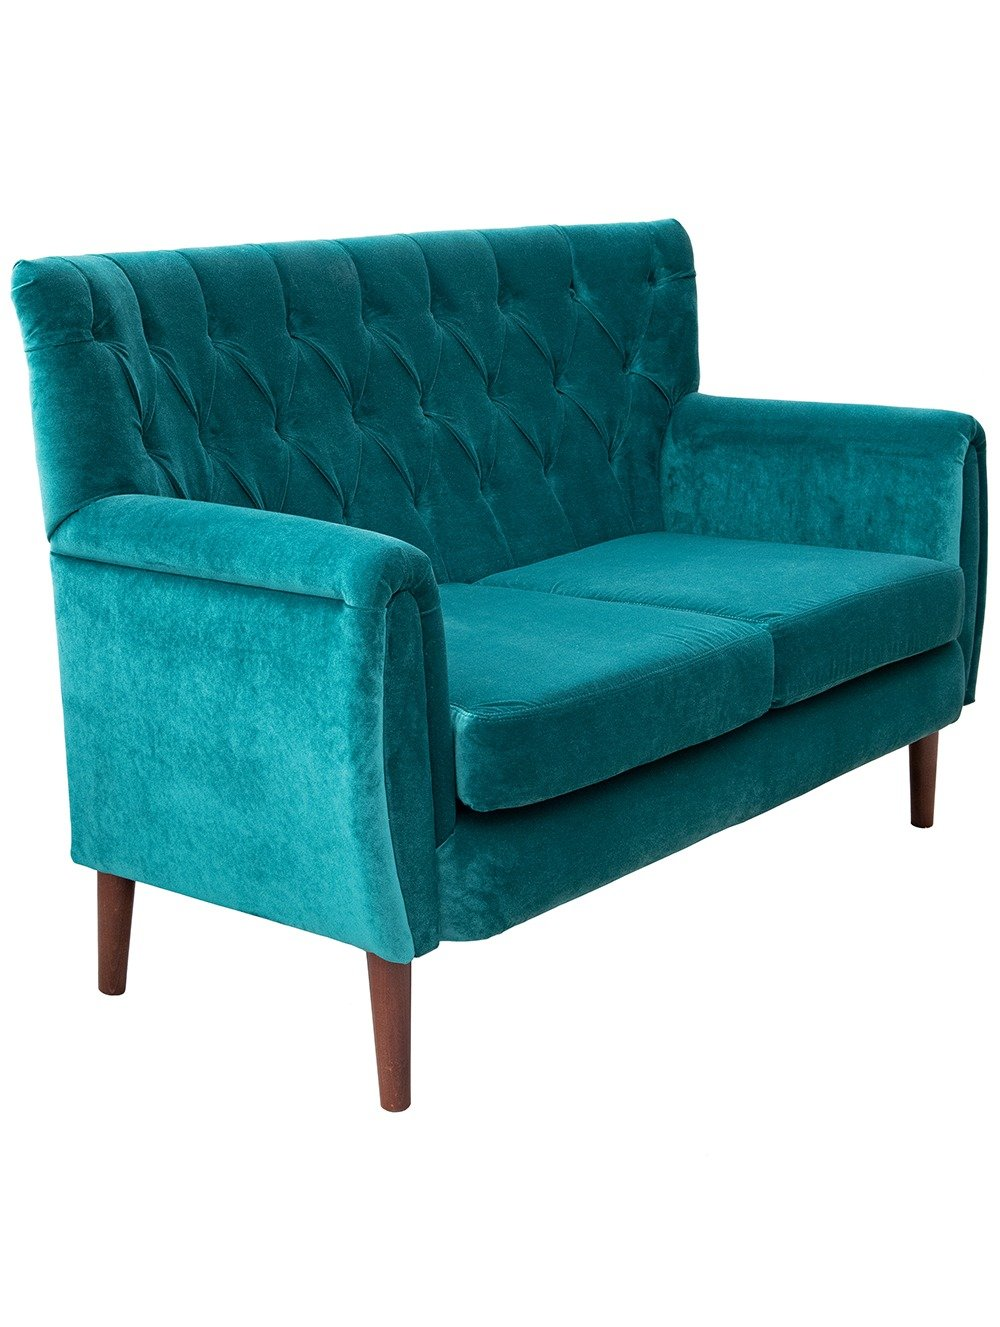 Custom Rose Sofa